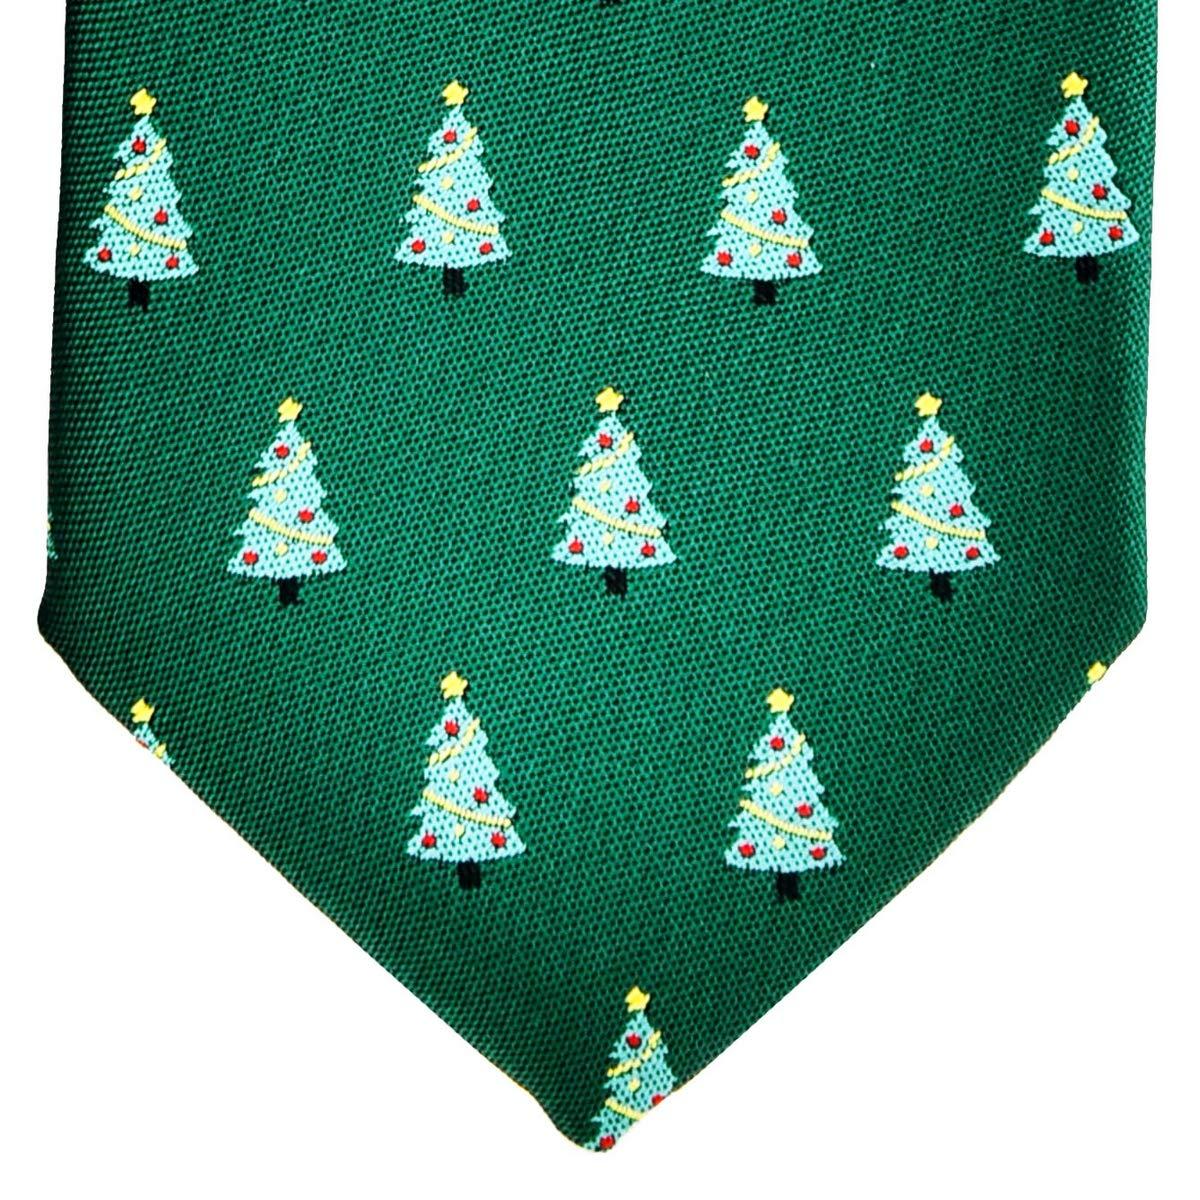 8-10 years Retreez Christmas Gingerbread Man Woven Microfiber Boys Tie